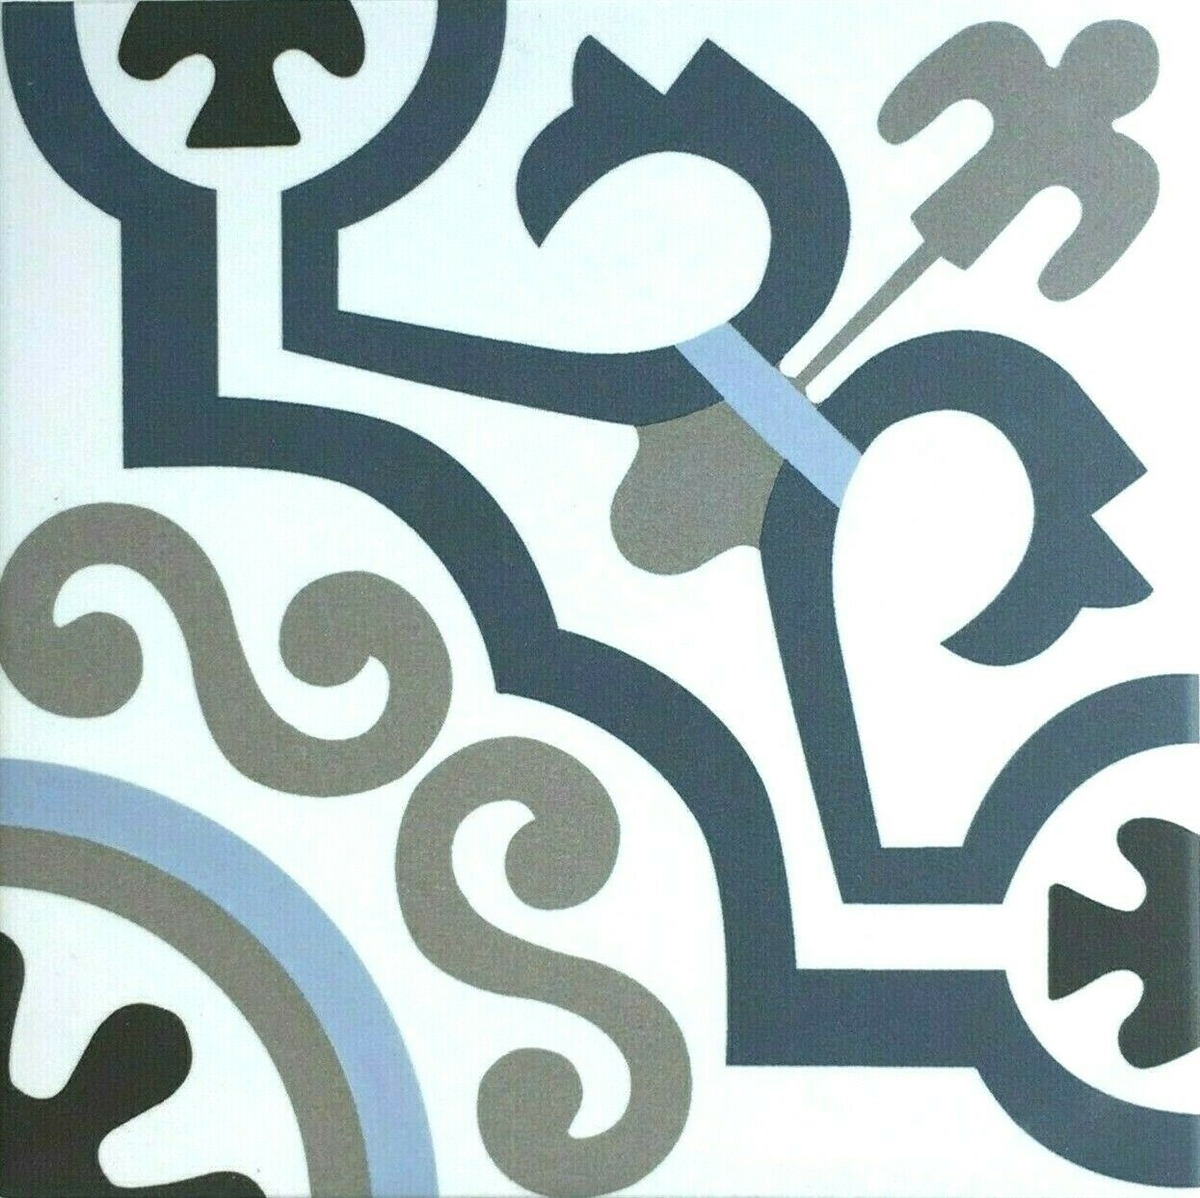 8x8 versay blue white encaustic pattern porcelain tile